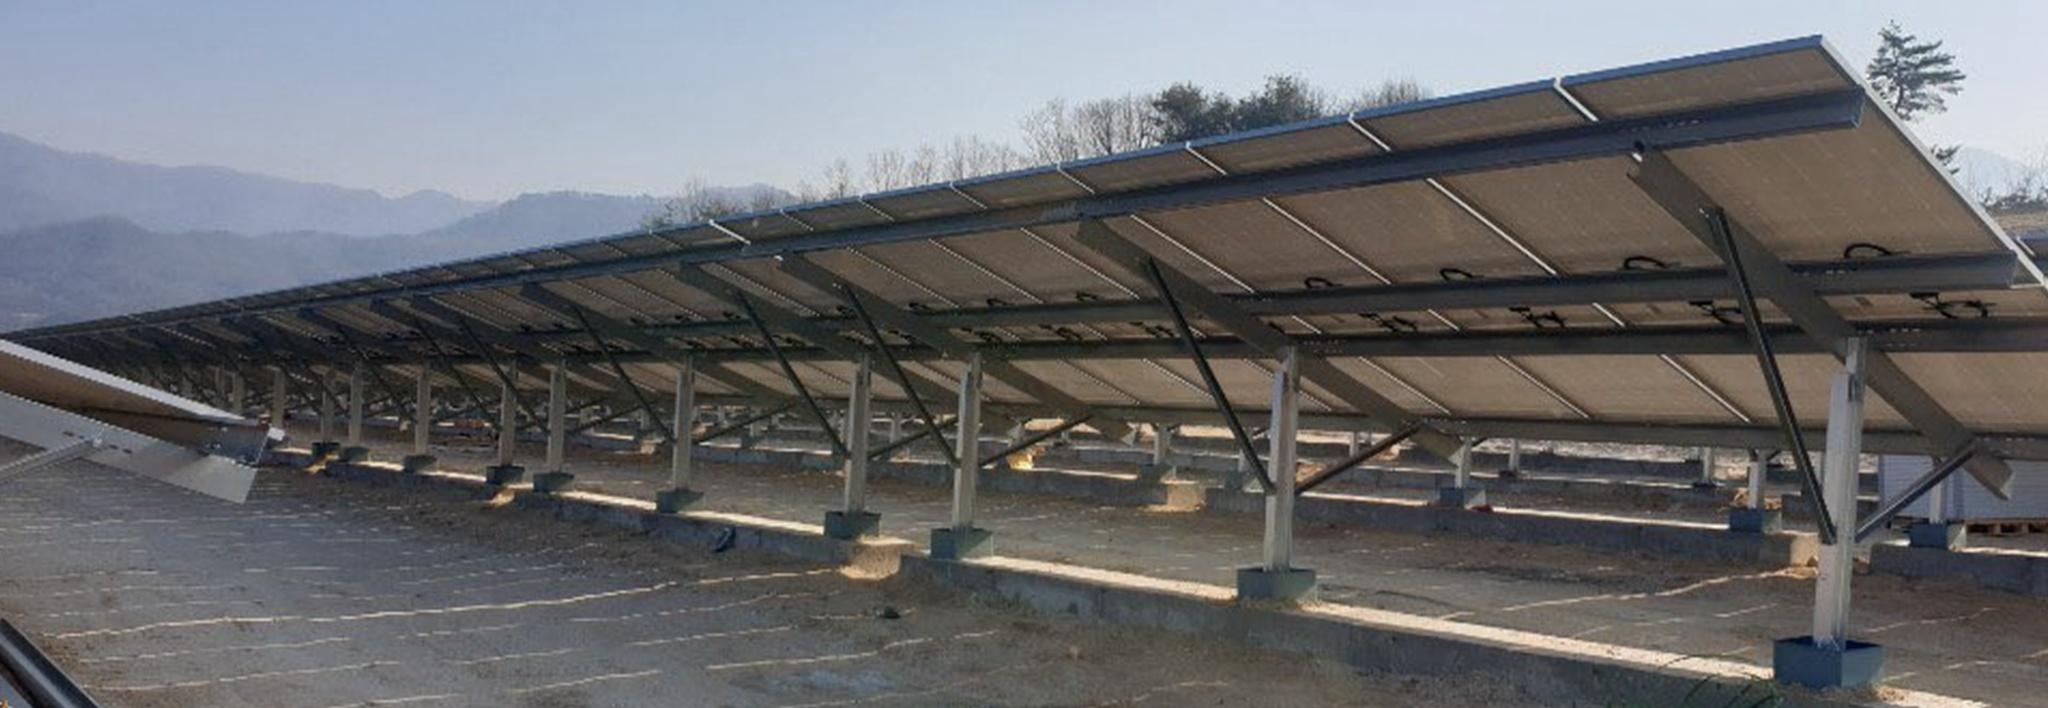 Clenergy Ground-mount PV-ezRack STMAC 1.6MW Solar Project in Korea